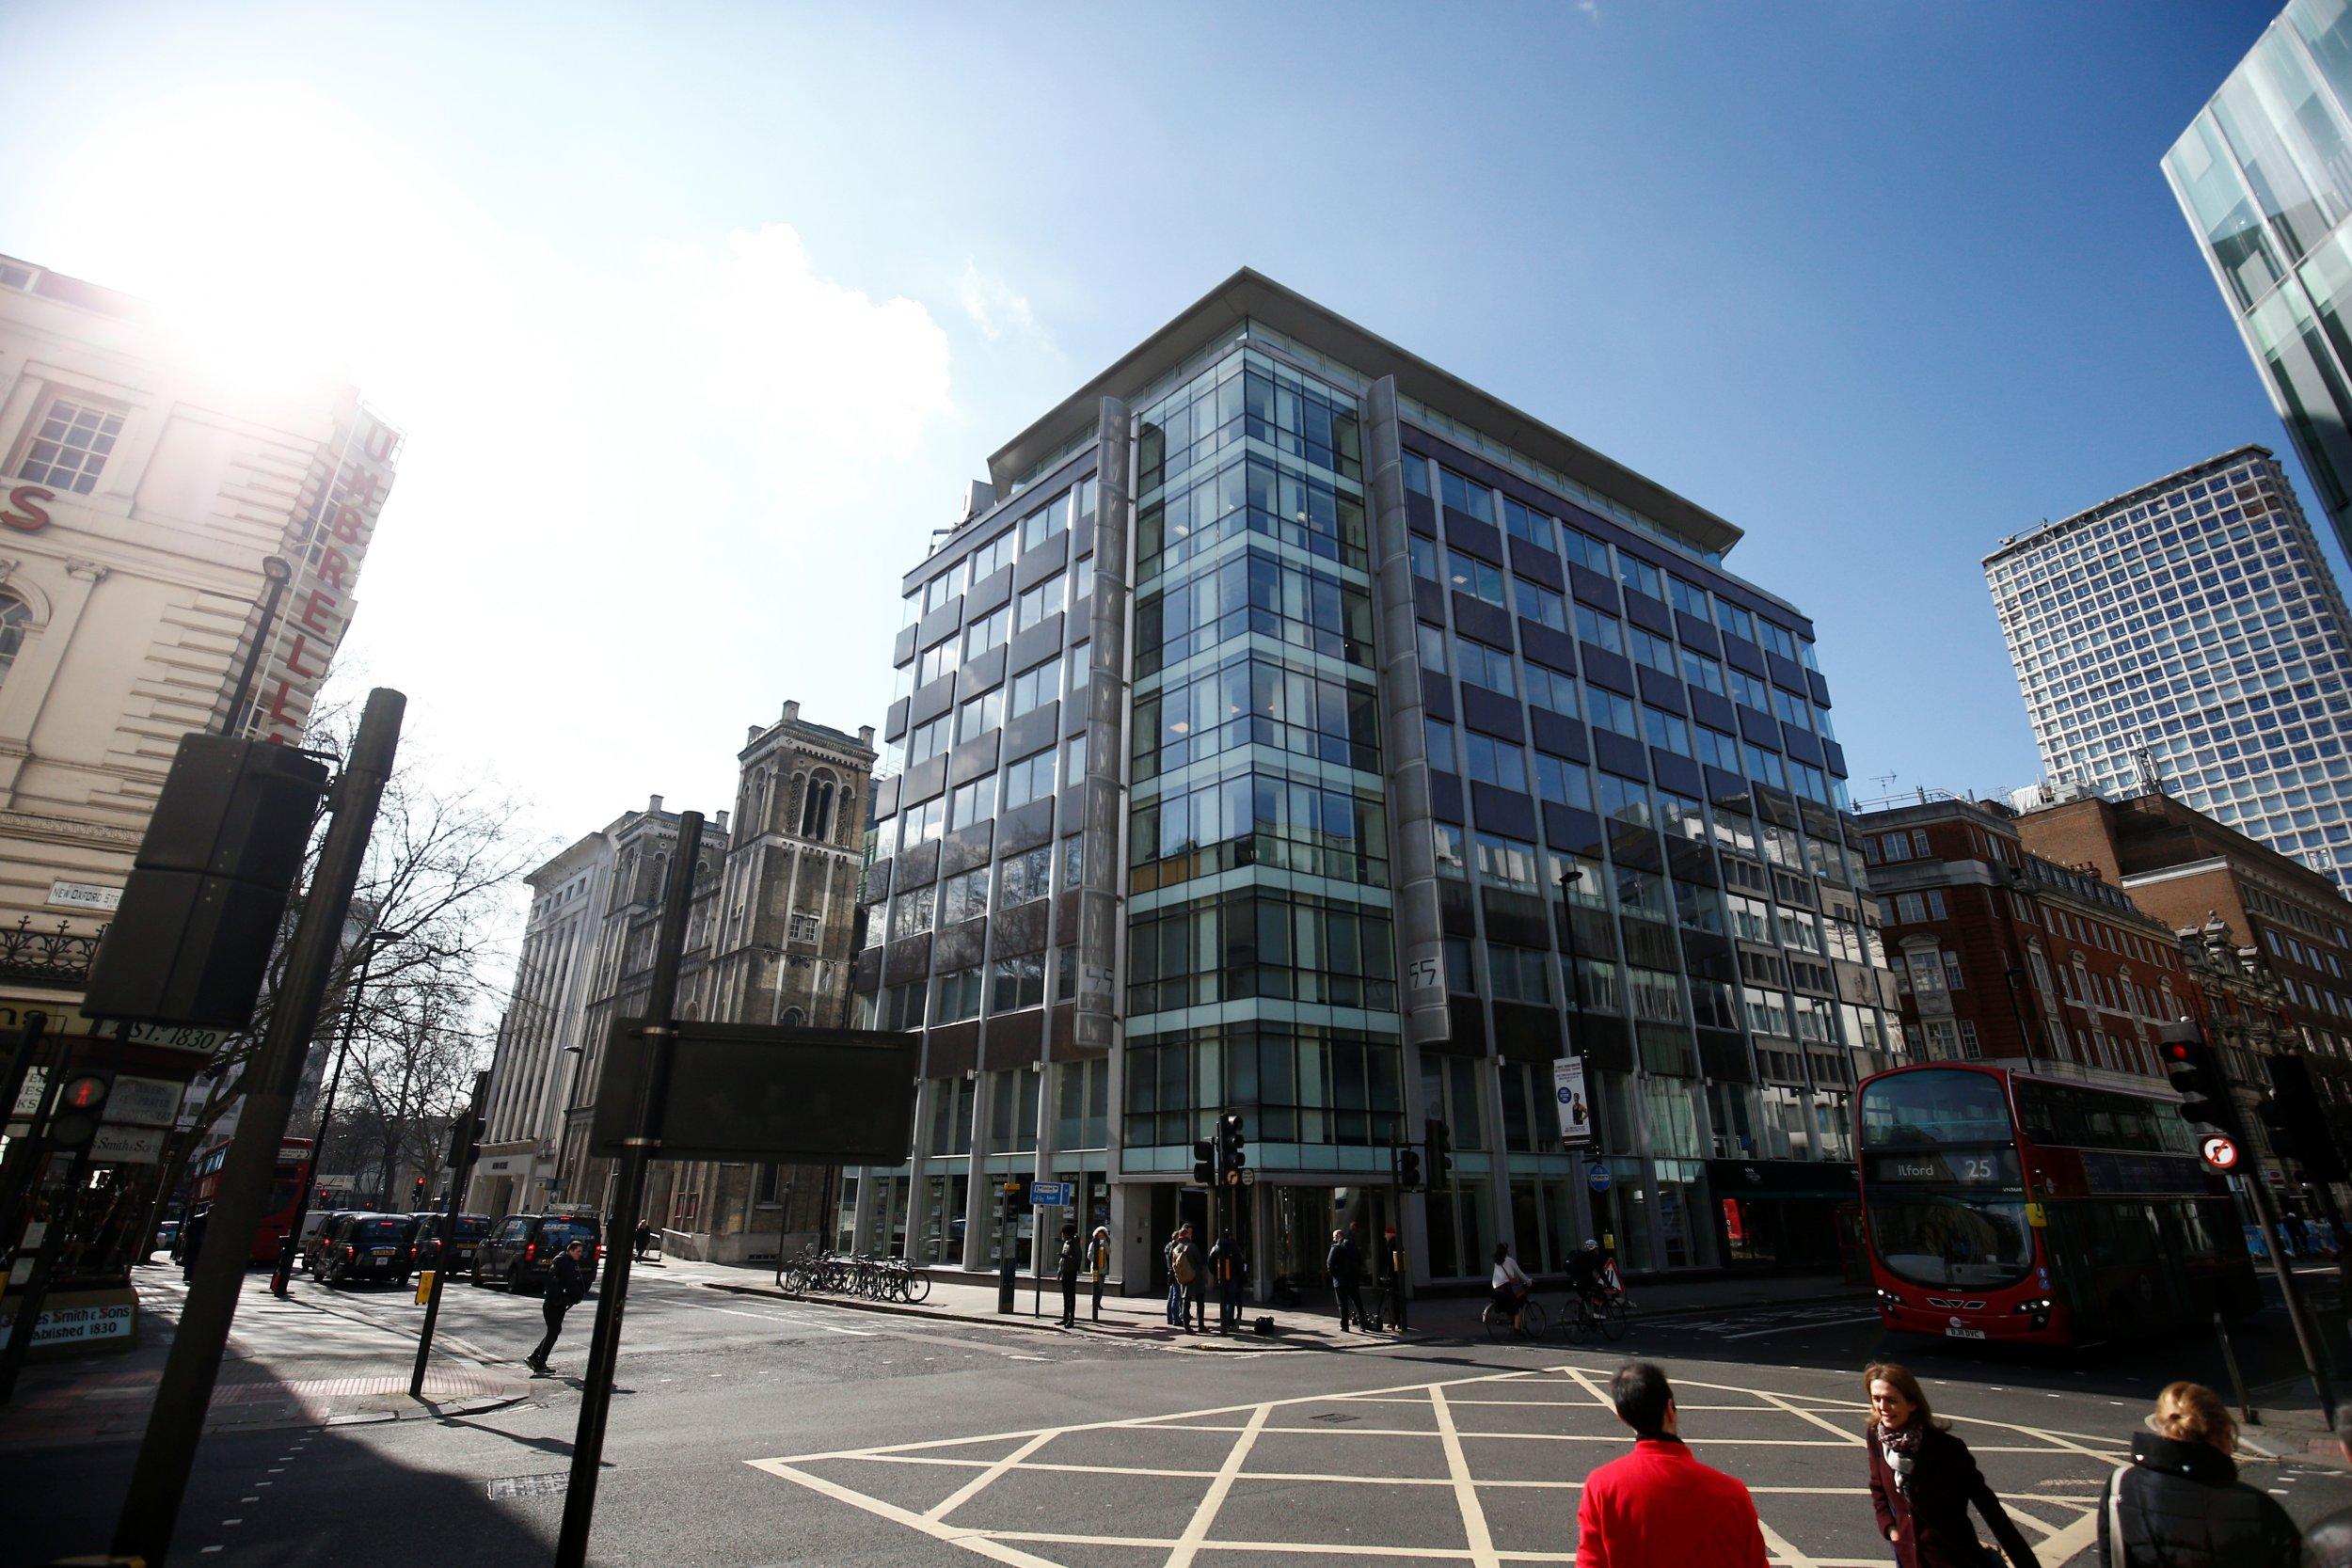 Cambridge Analytica HQ